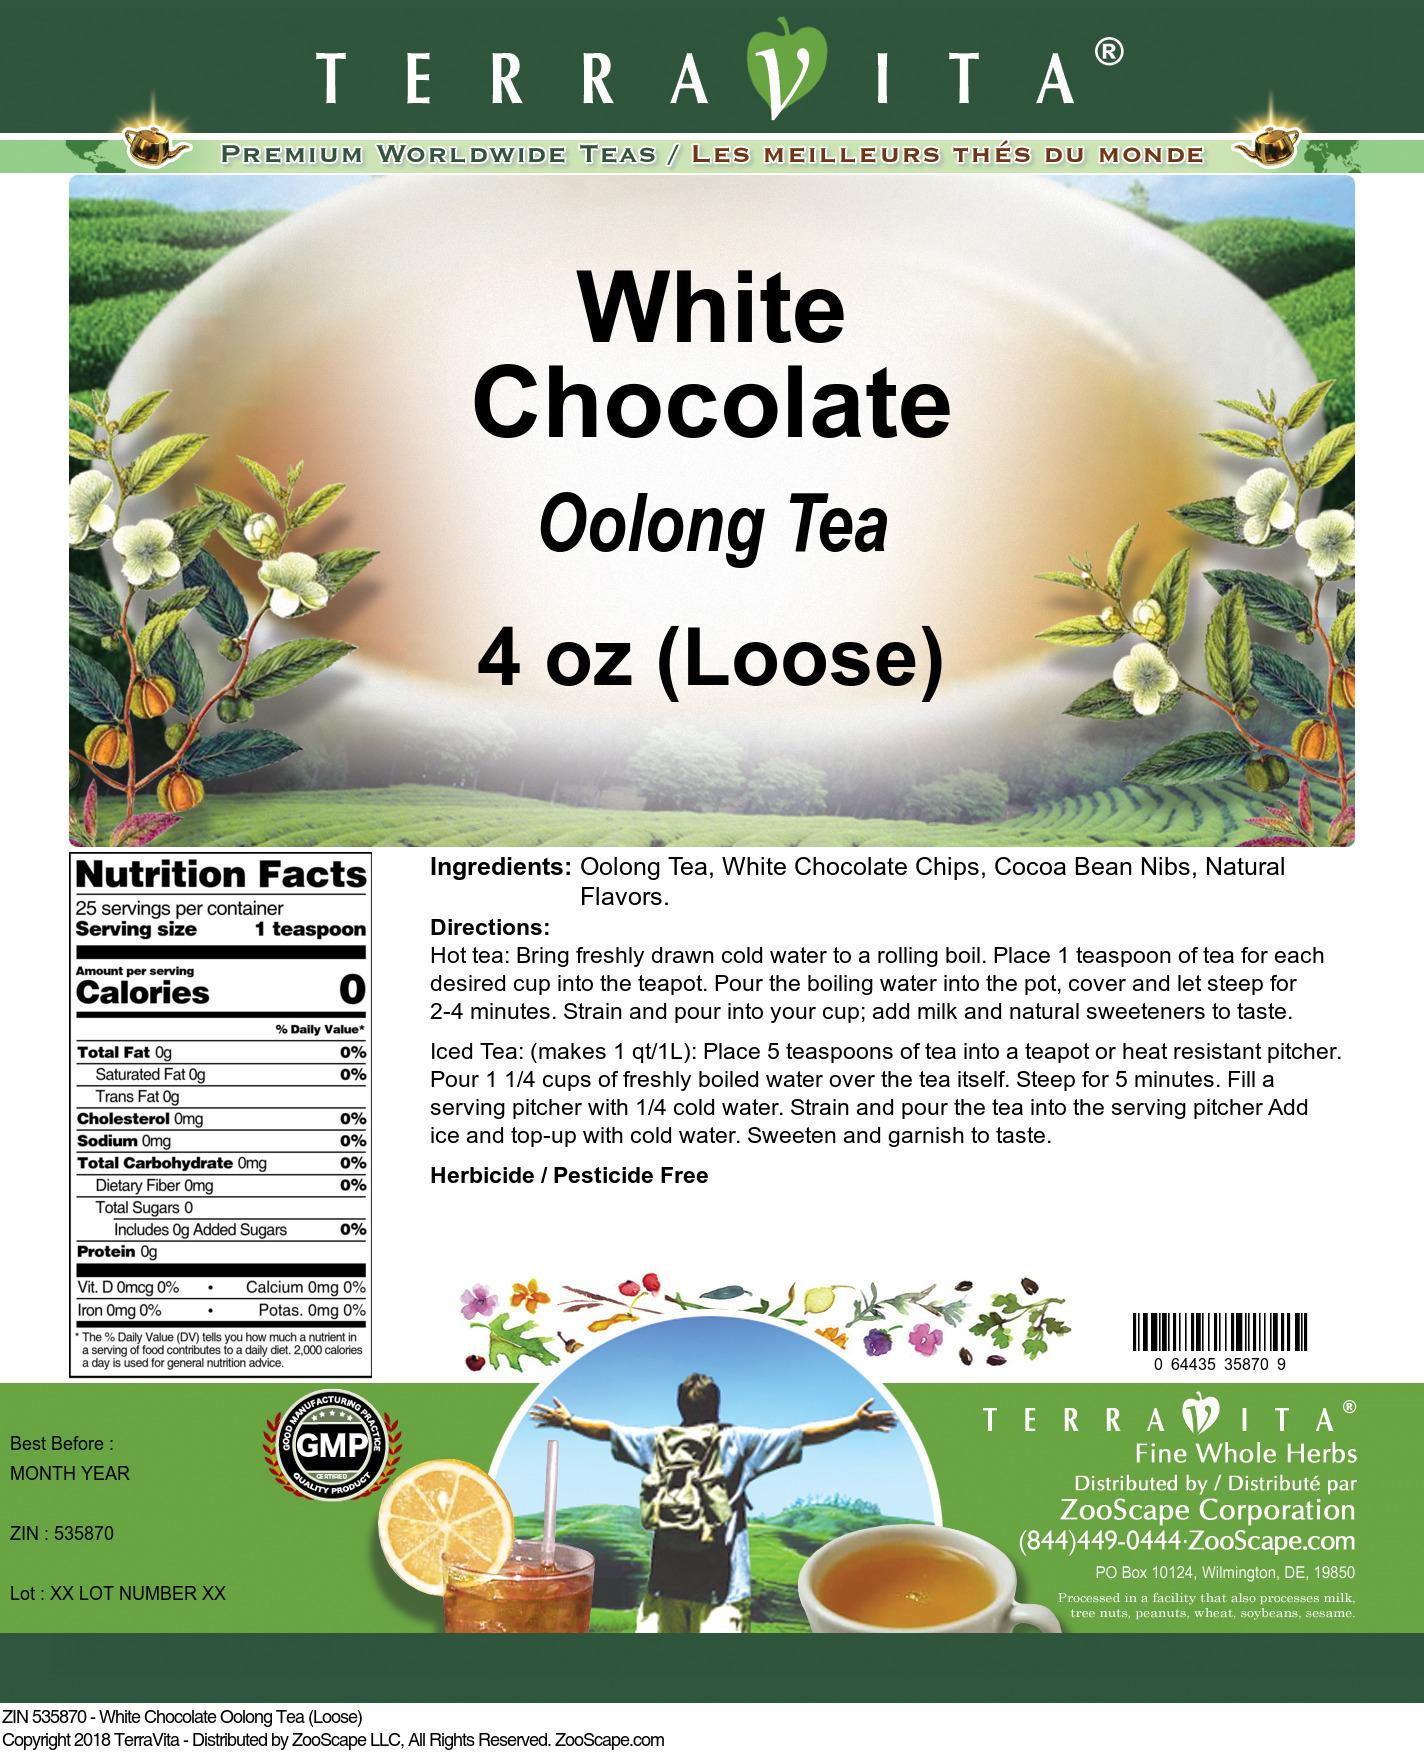 White Chocolate Oolong Tea